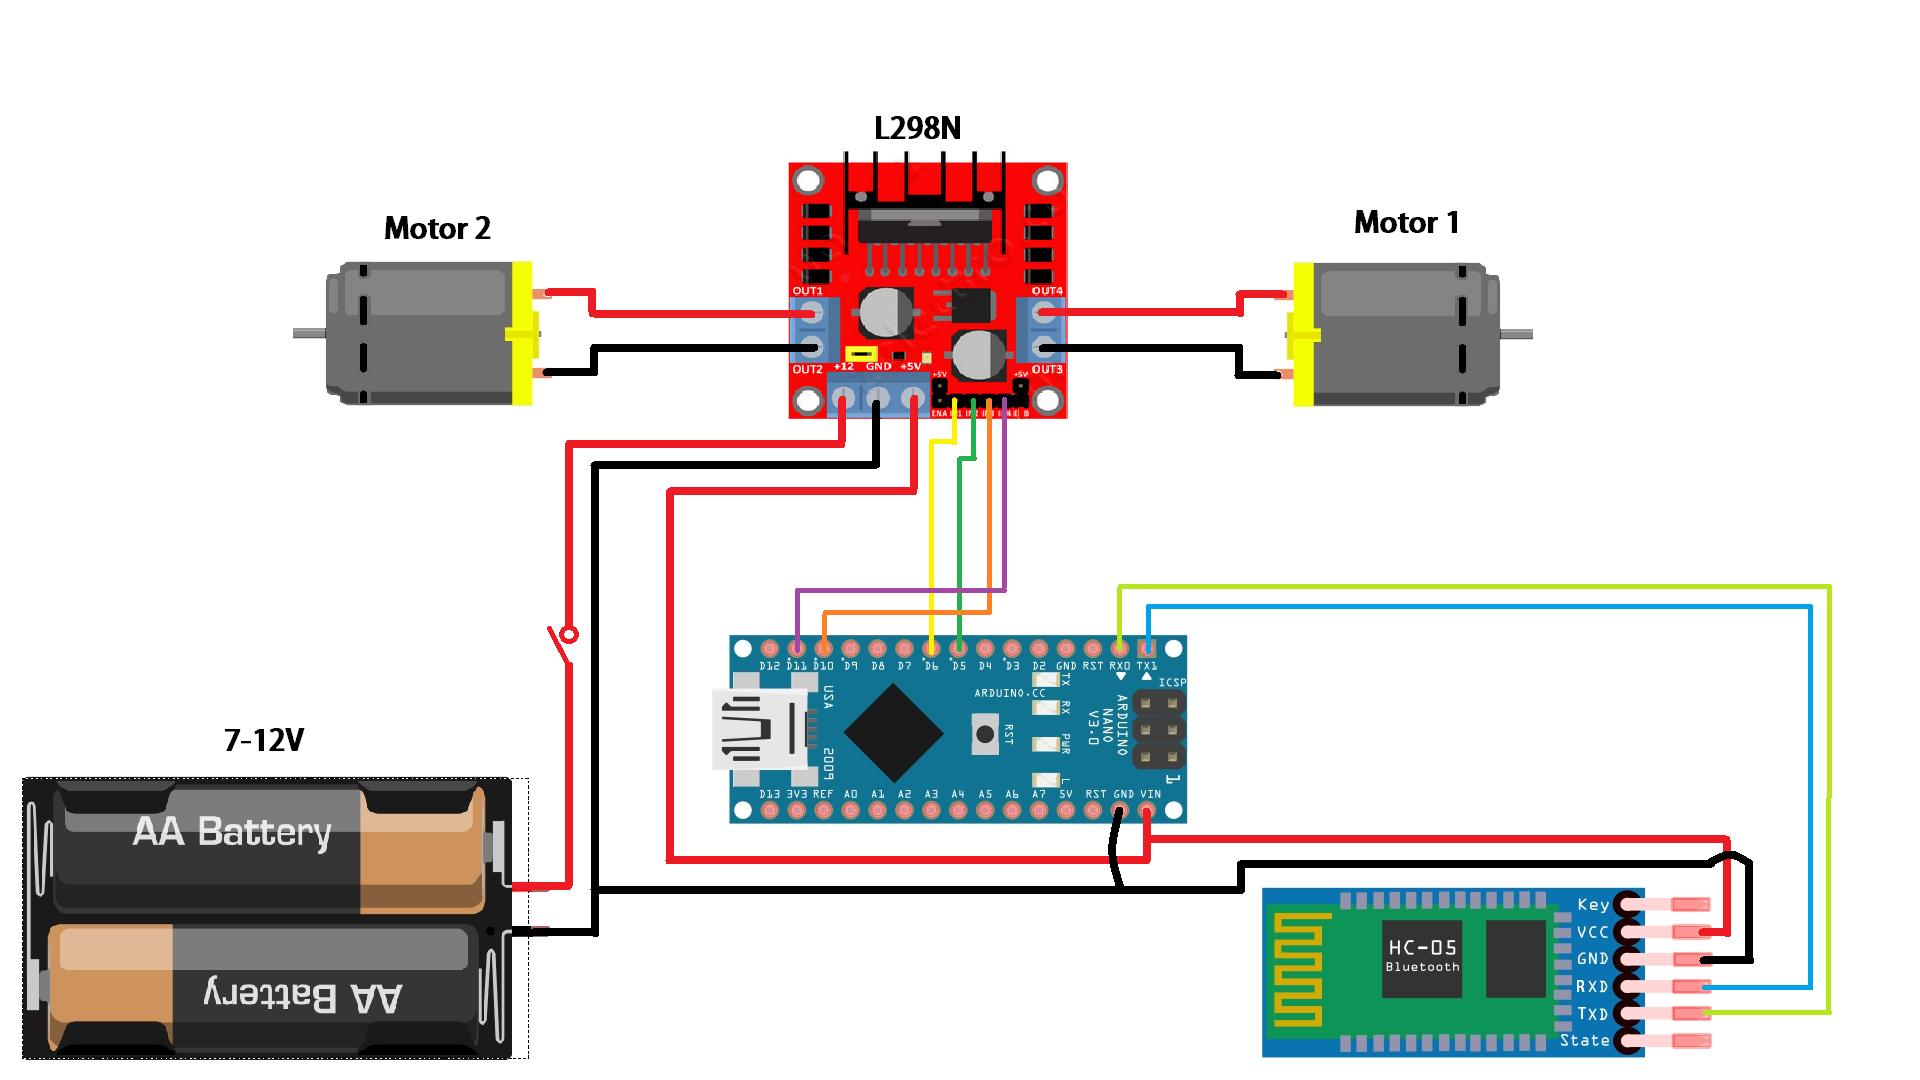 Picture of Wiring Diagram/Circuit Diagram